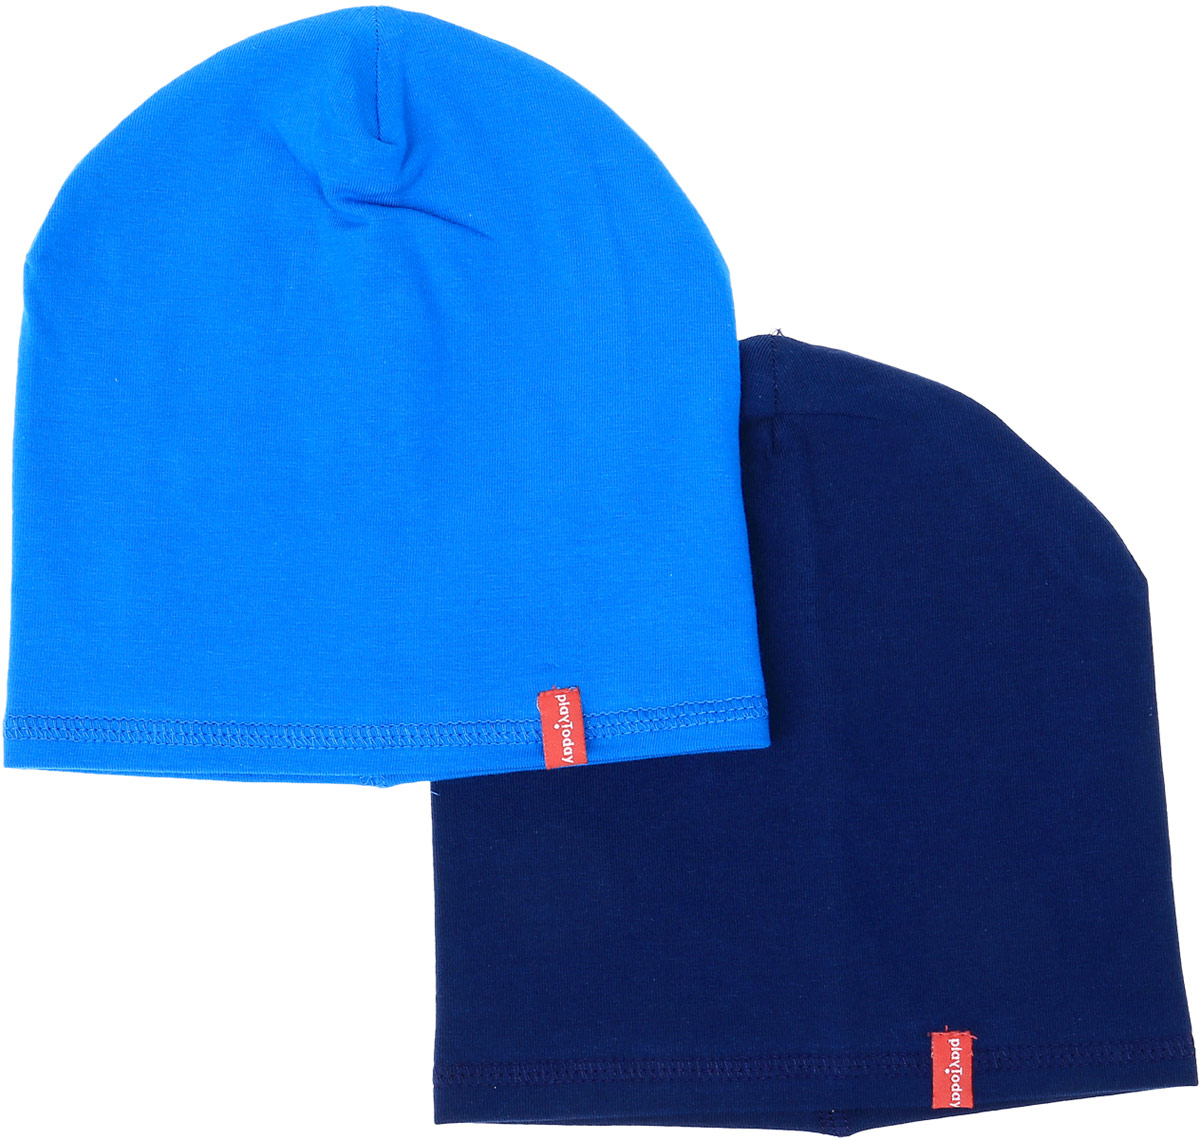 Шапка для мальчика PlayToday, цвет: темно-синий, голубой, 2 шт. 377043. Размер 46 шапки mialt шапка